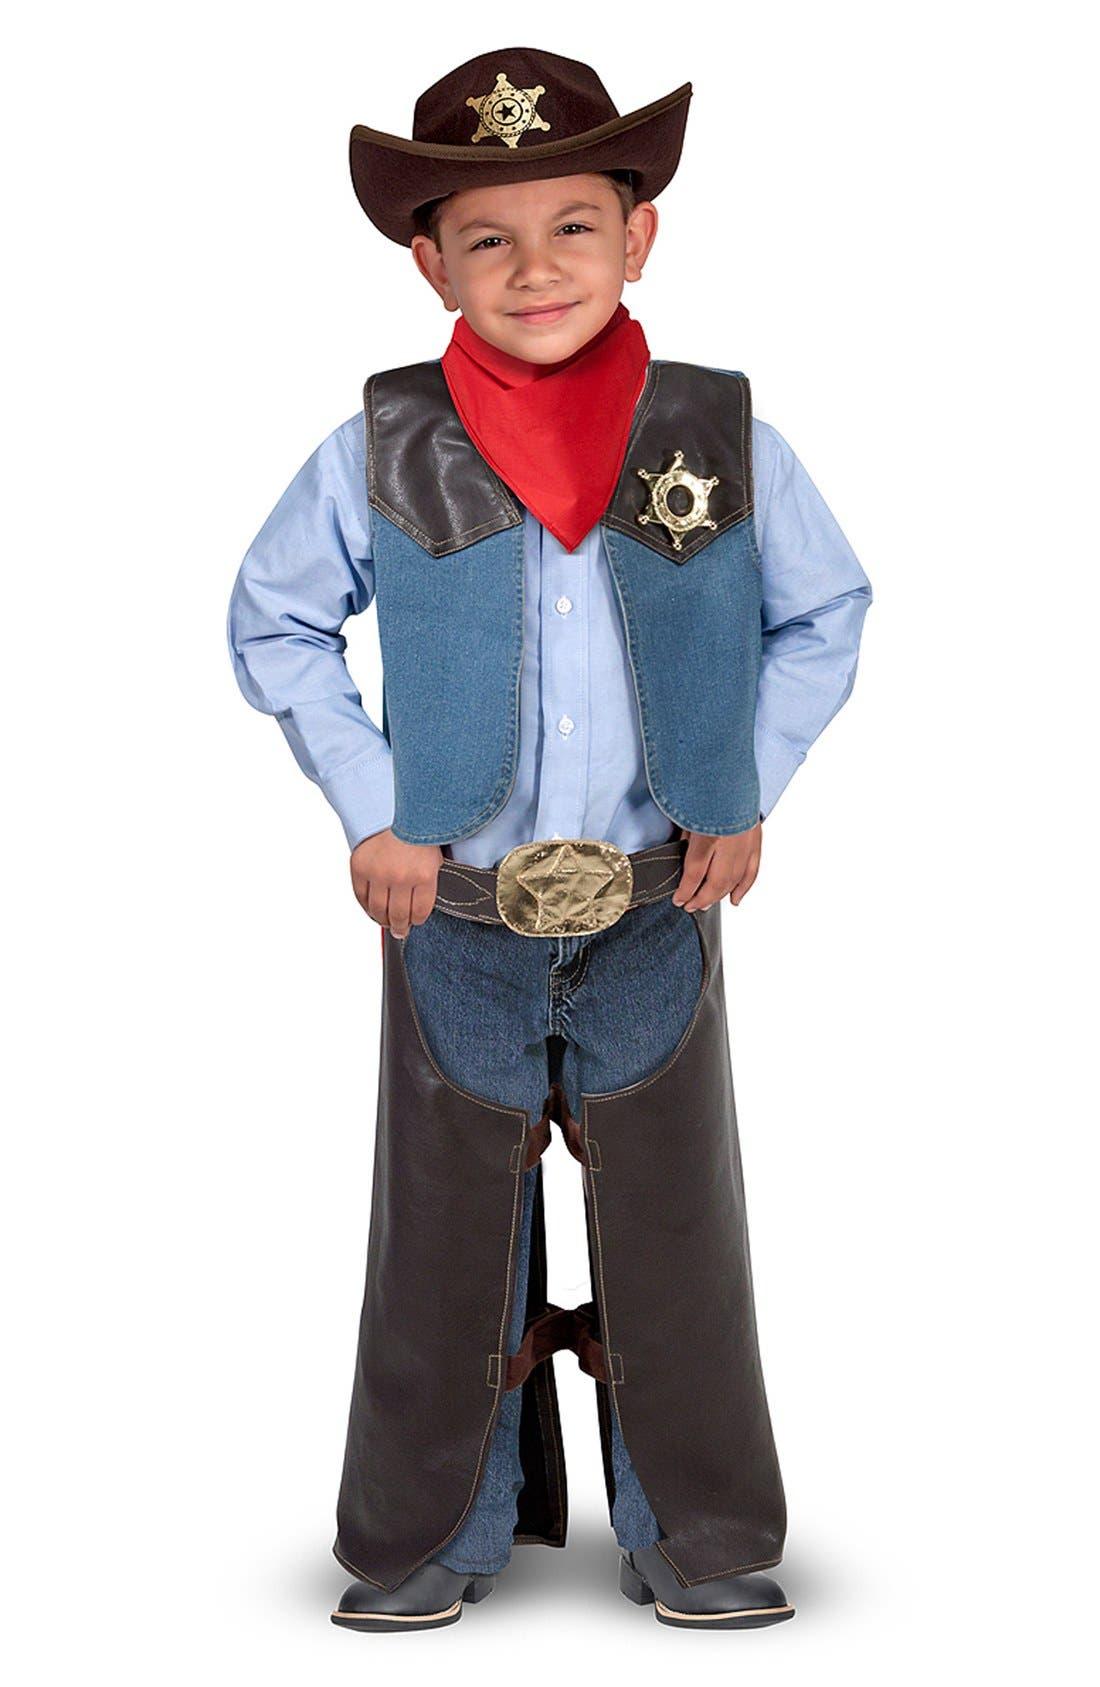 Cowboy Role Play Set,                         Main,                         color, Brown